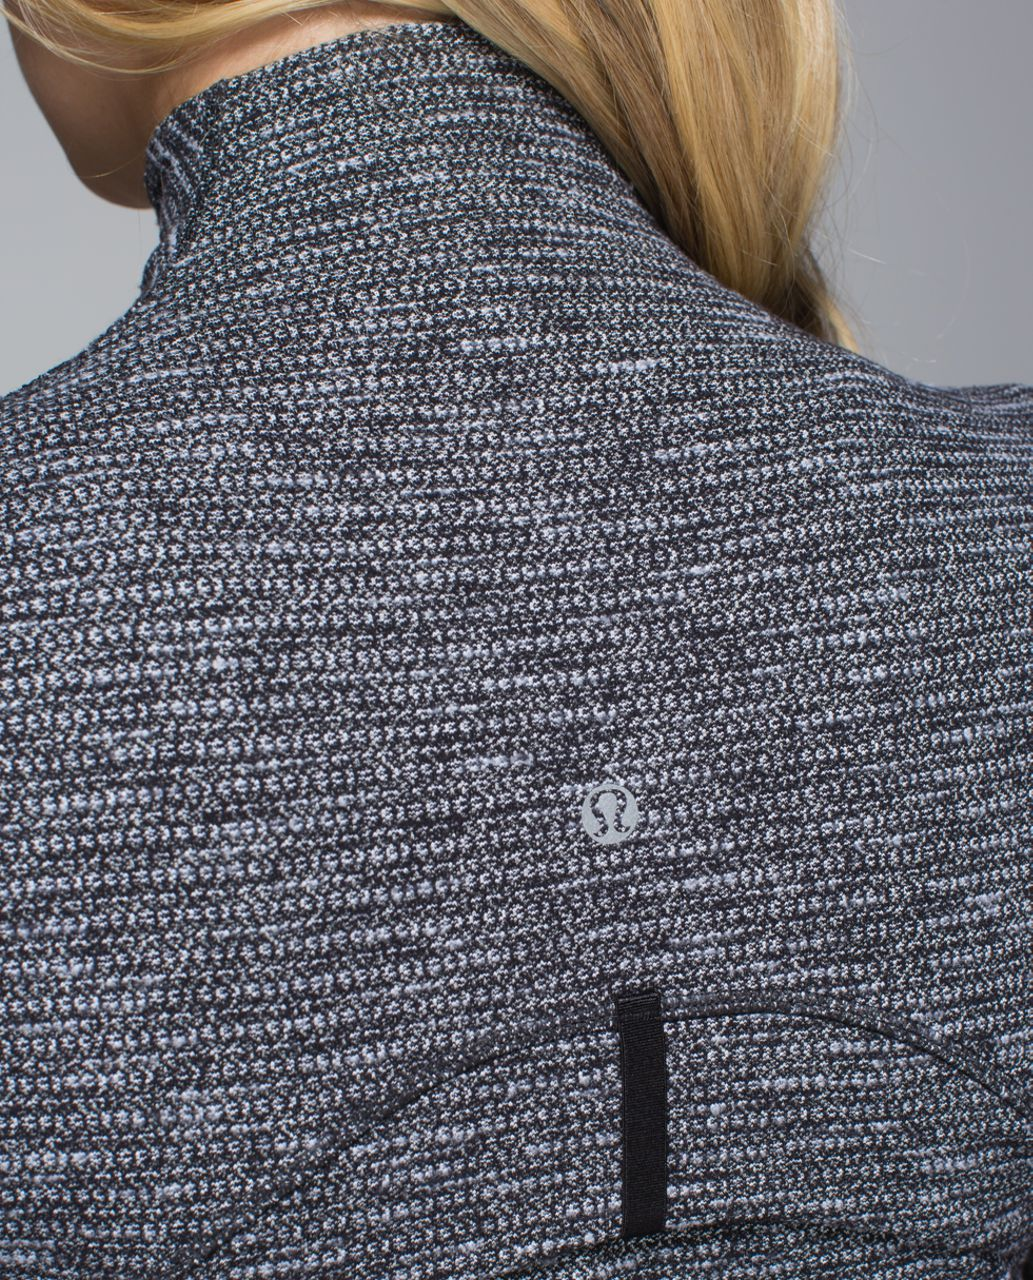 Lululemon Define Jacket - Coco Pique Black White